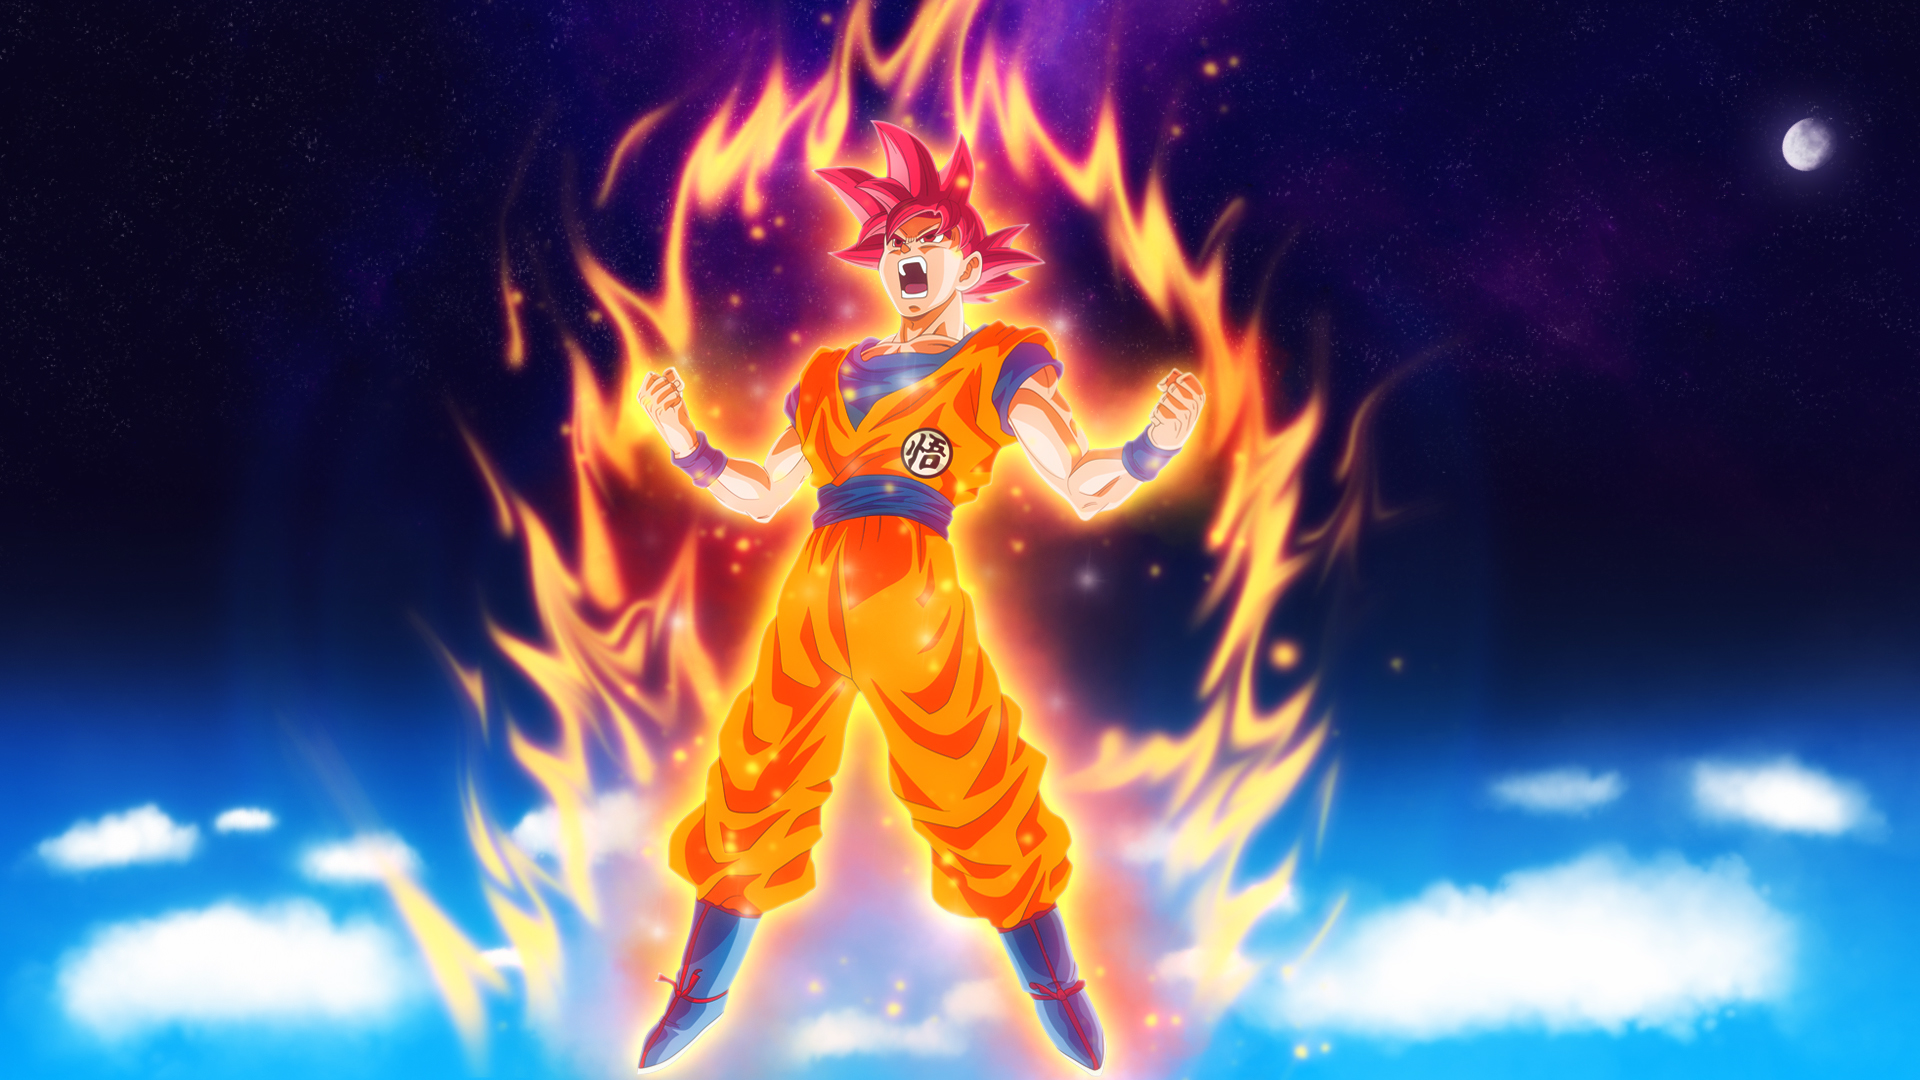 2048x2048 Anthem Ipad Air Hd 4k Wallpapers Images: 2048x2048 Goku Dragon Ball Super Anime HD Ipad Air HD 4k